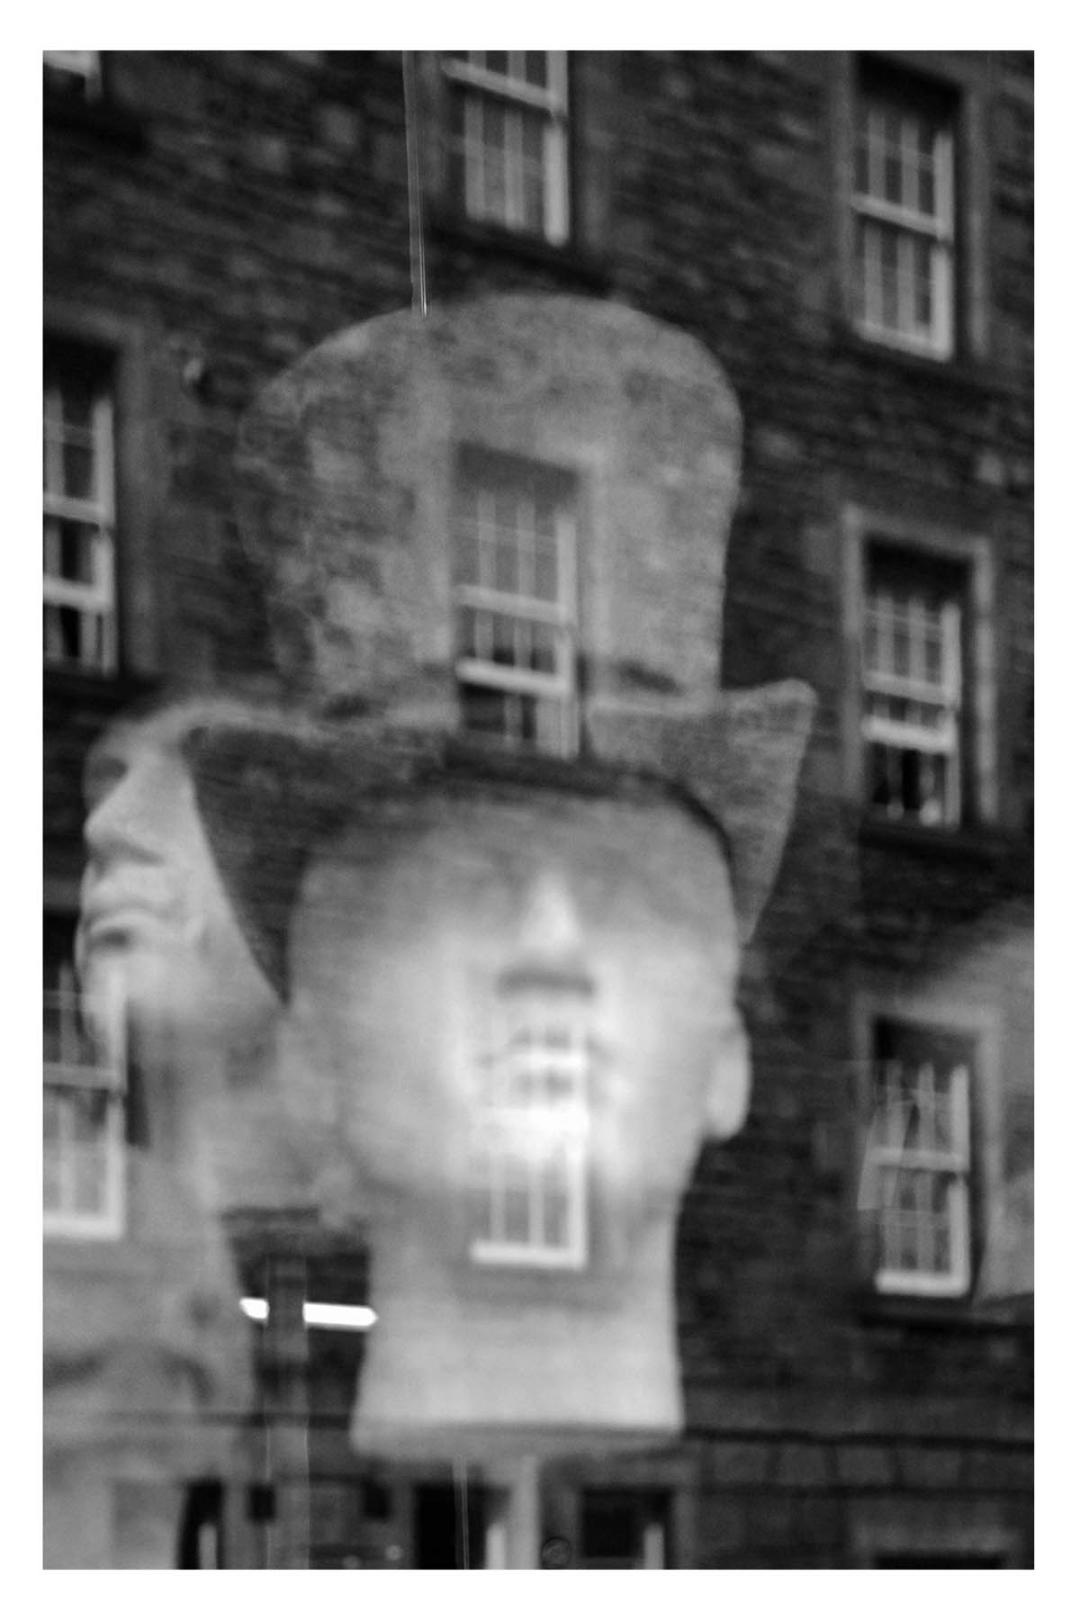 edinburghphotographytour04-64048.jpg